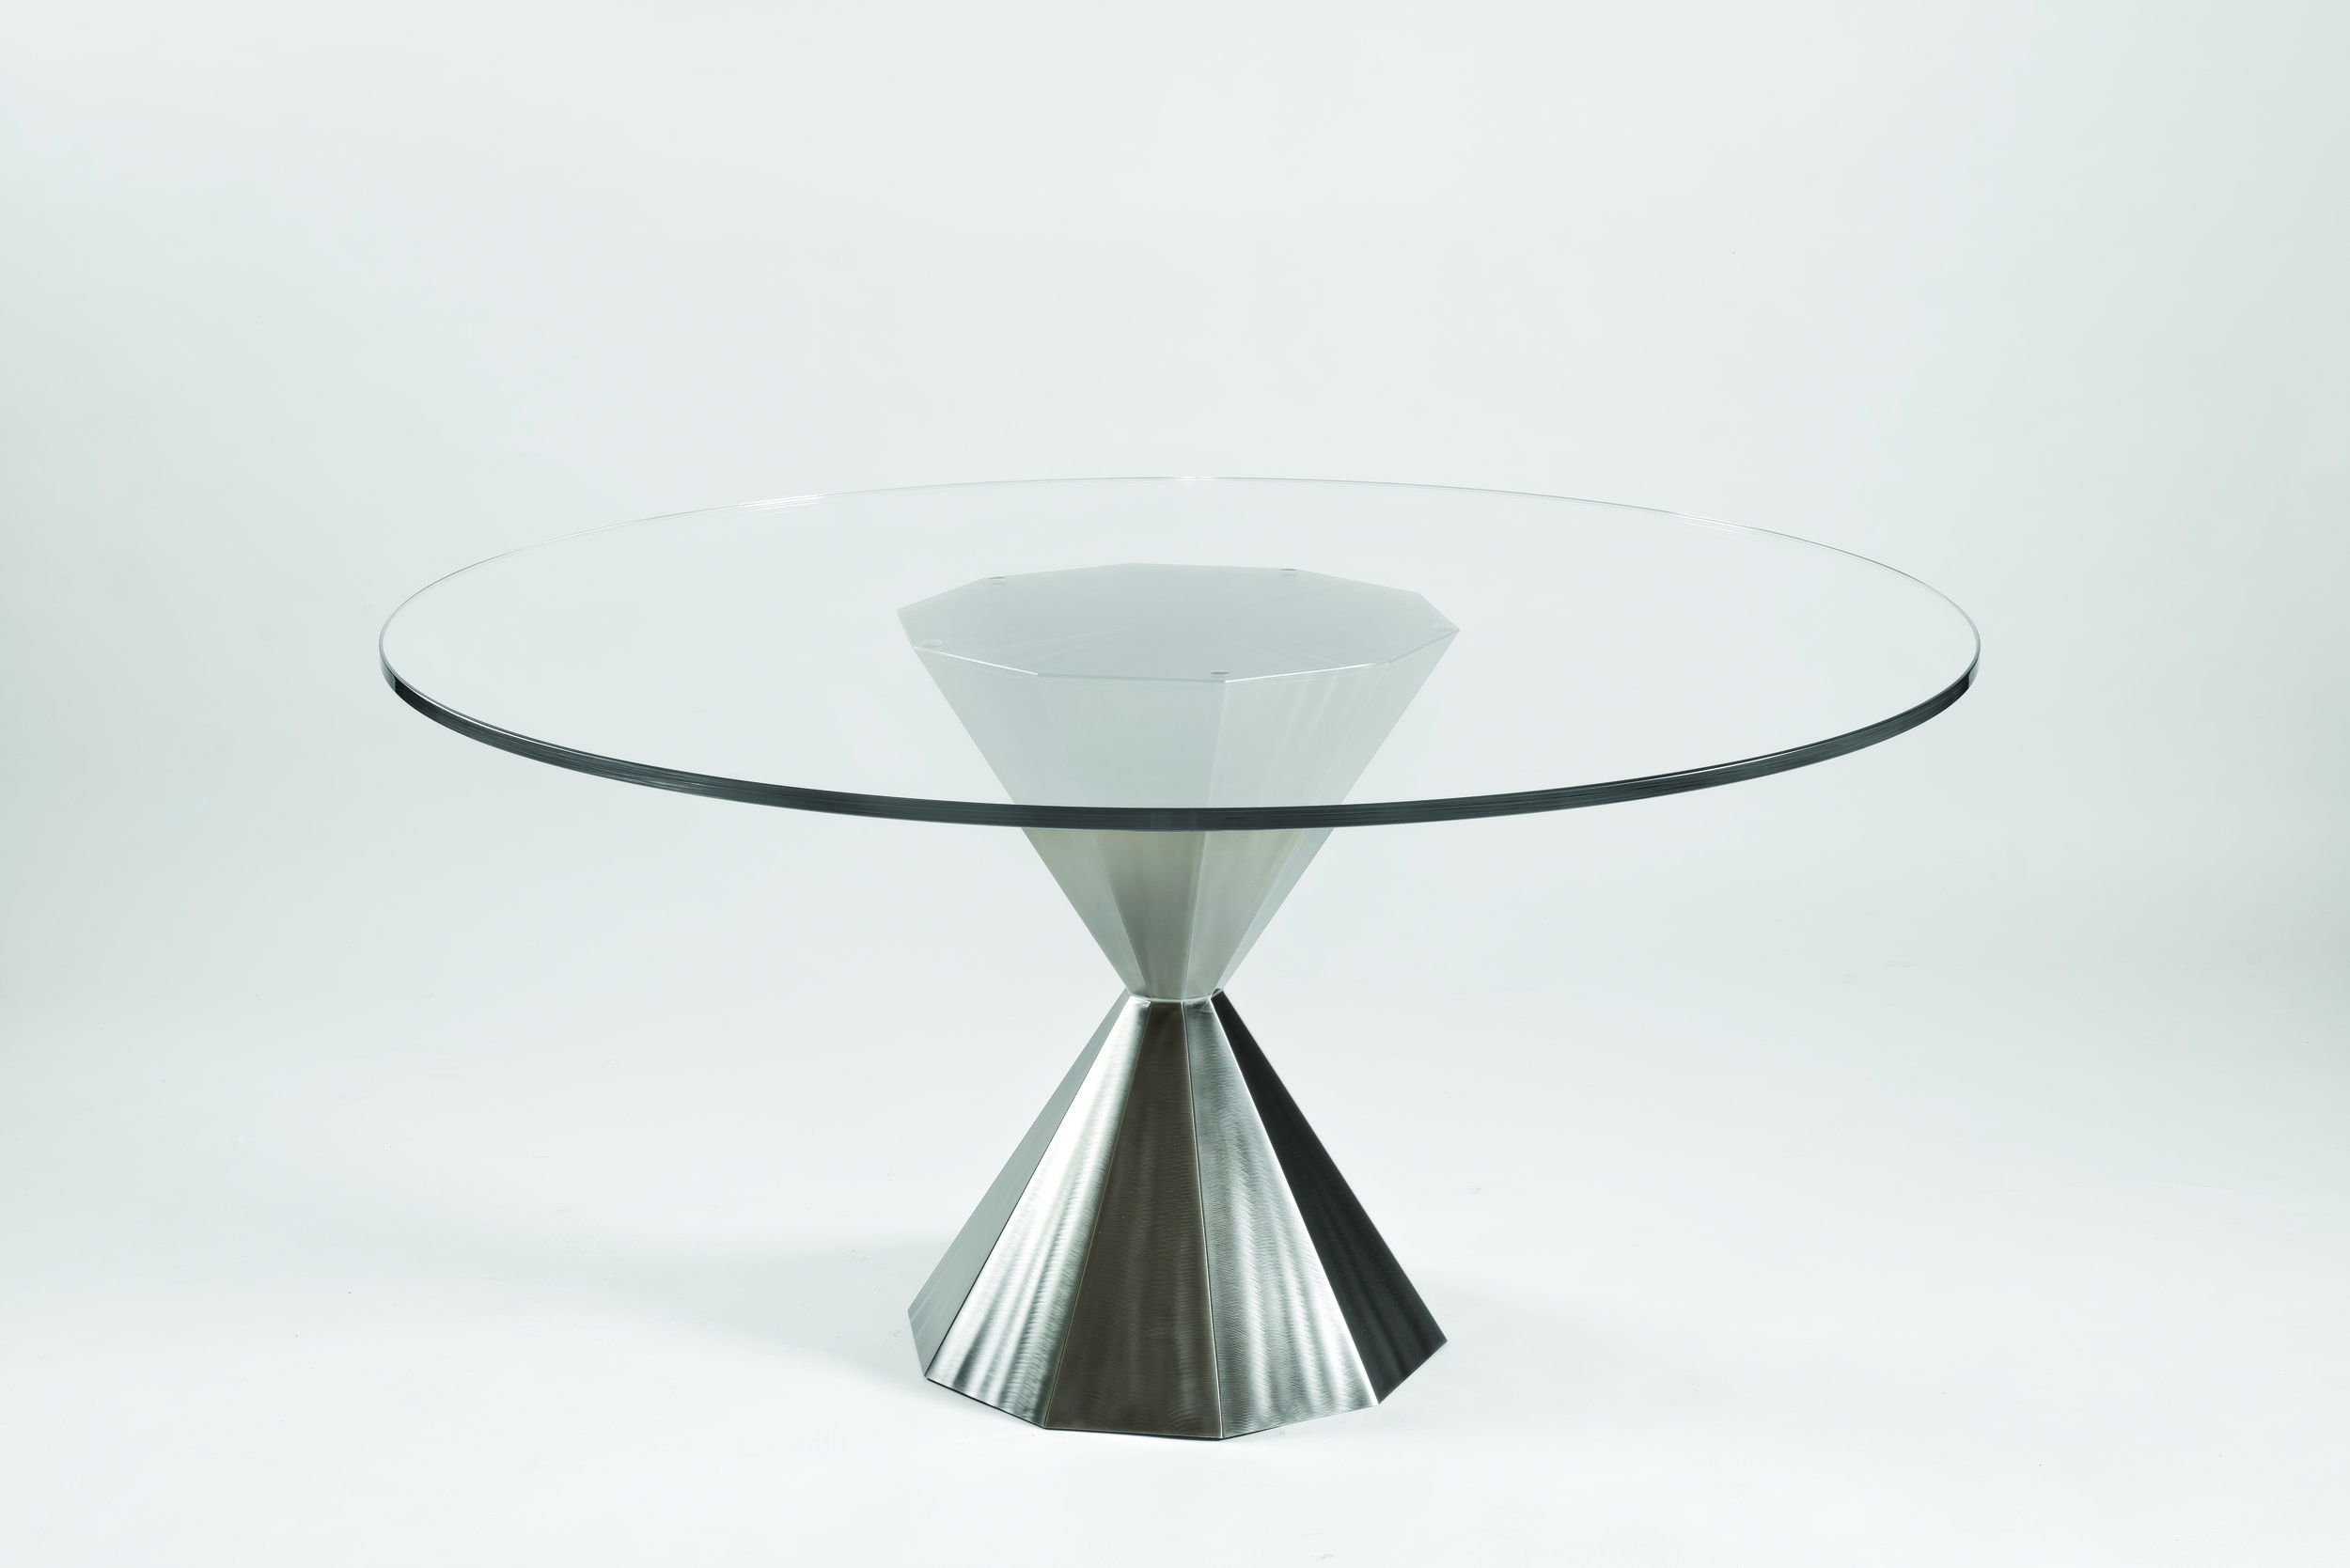 glass top (optional)